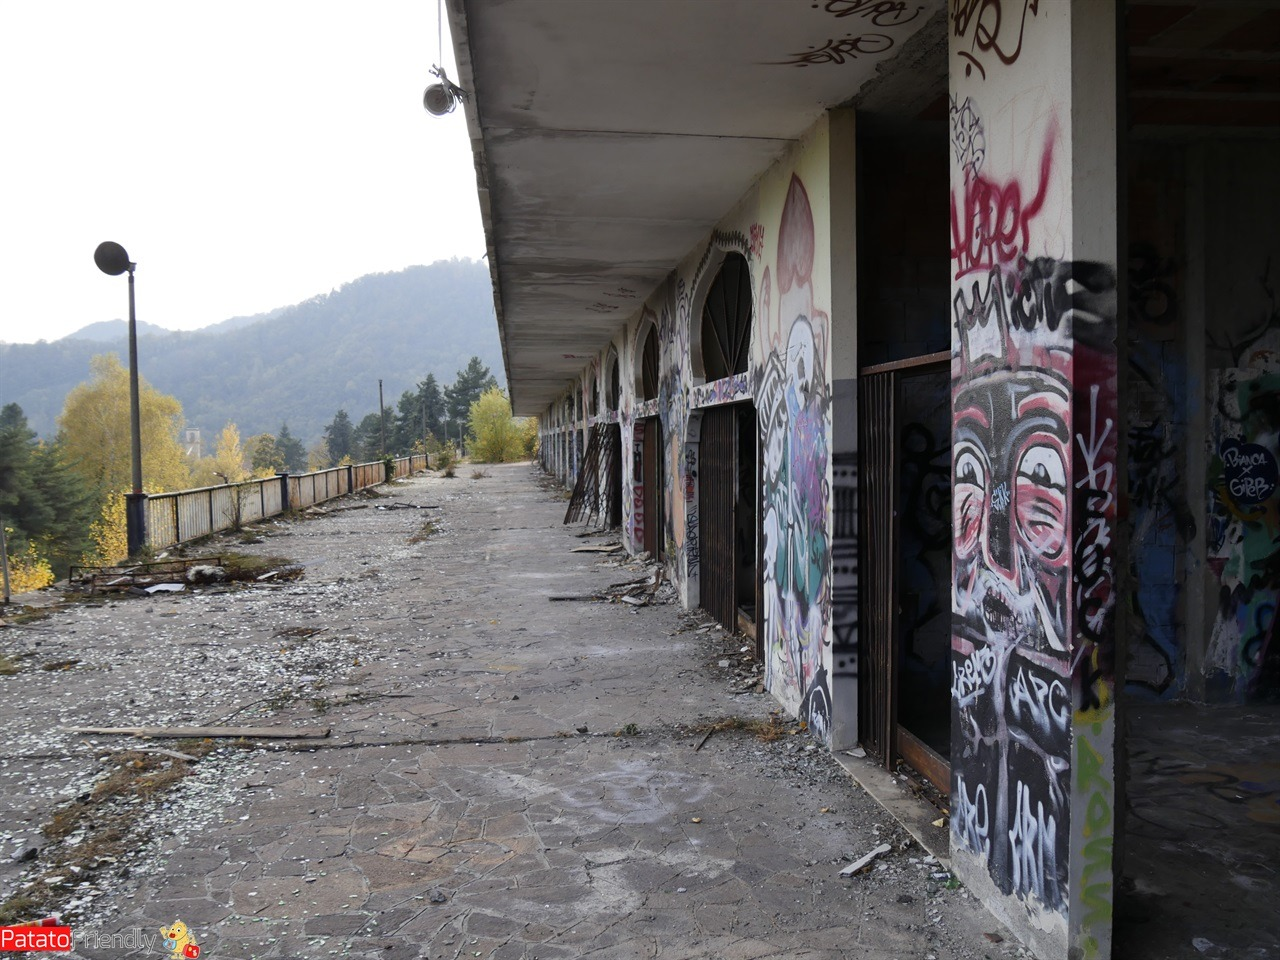 [cml_media_alt id='12752']Devastazione e street art a Consonno[/cml_media_alt]